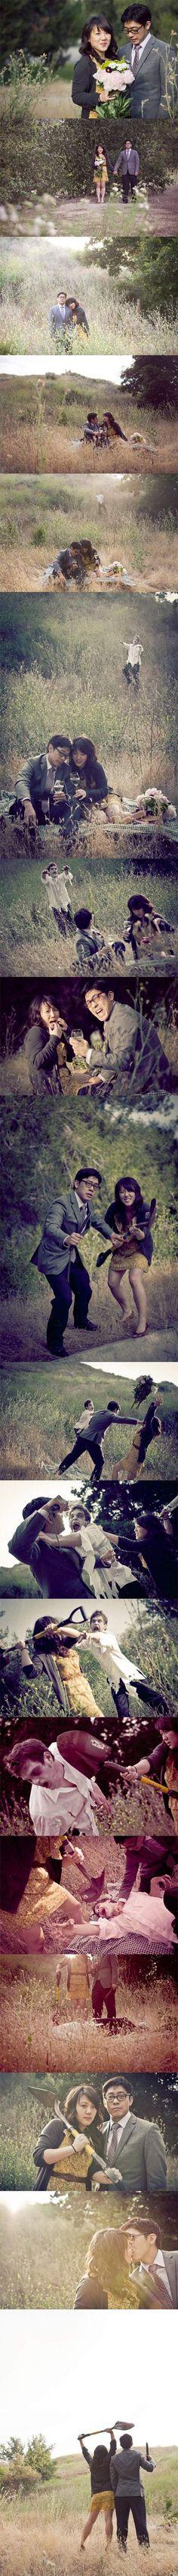 Best Wedding Pics EVER!!!!!